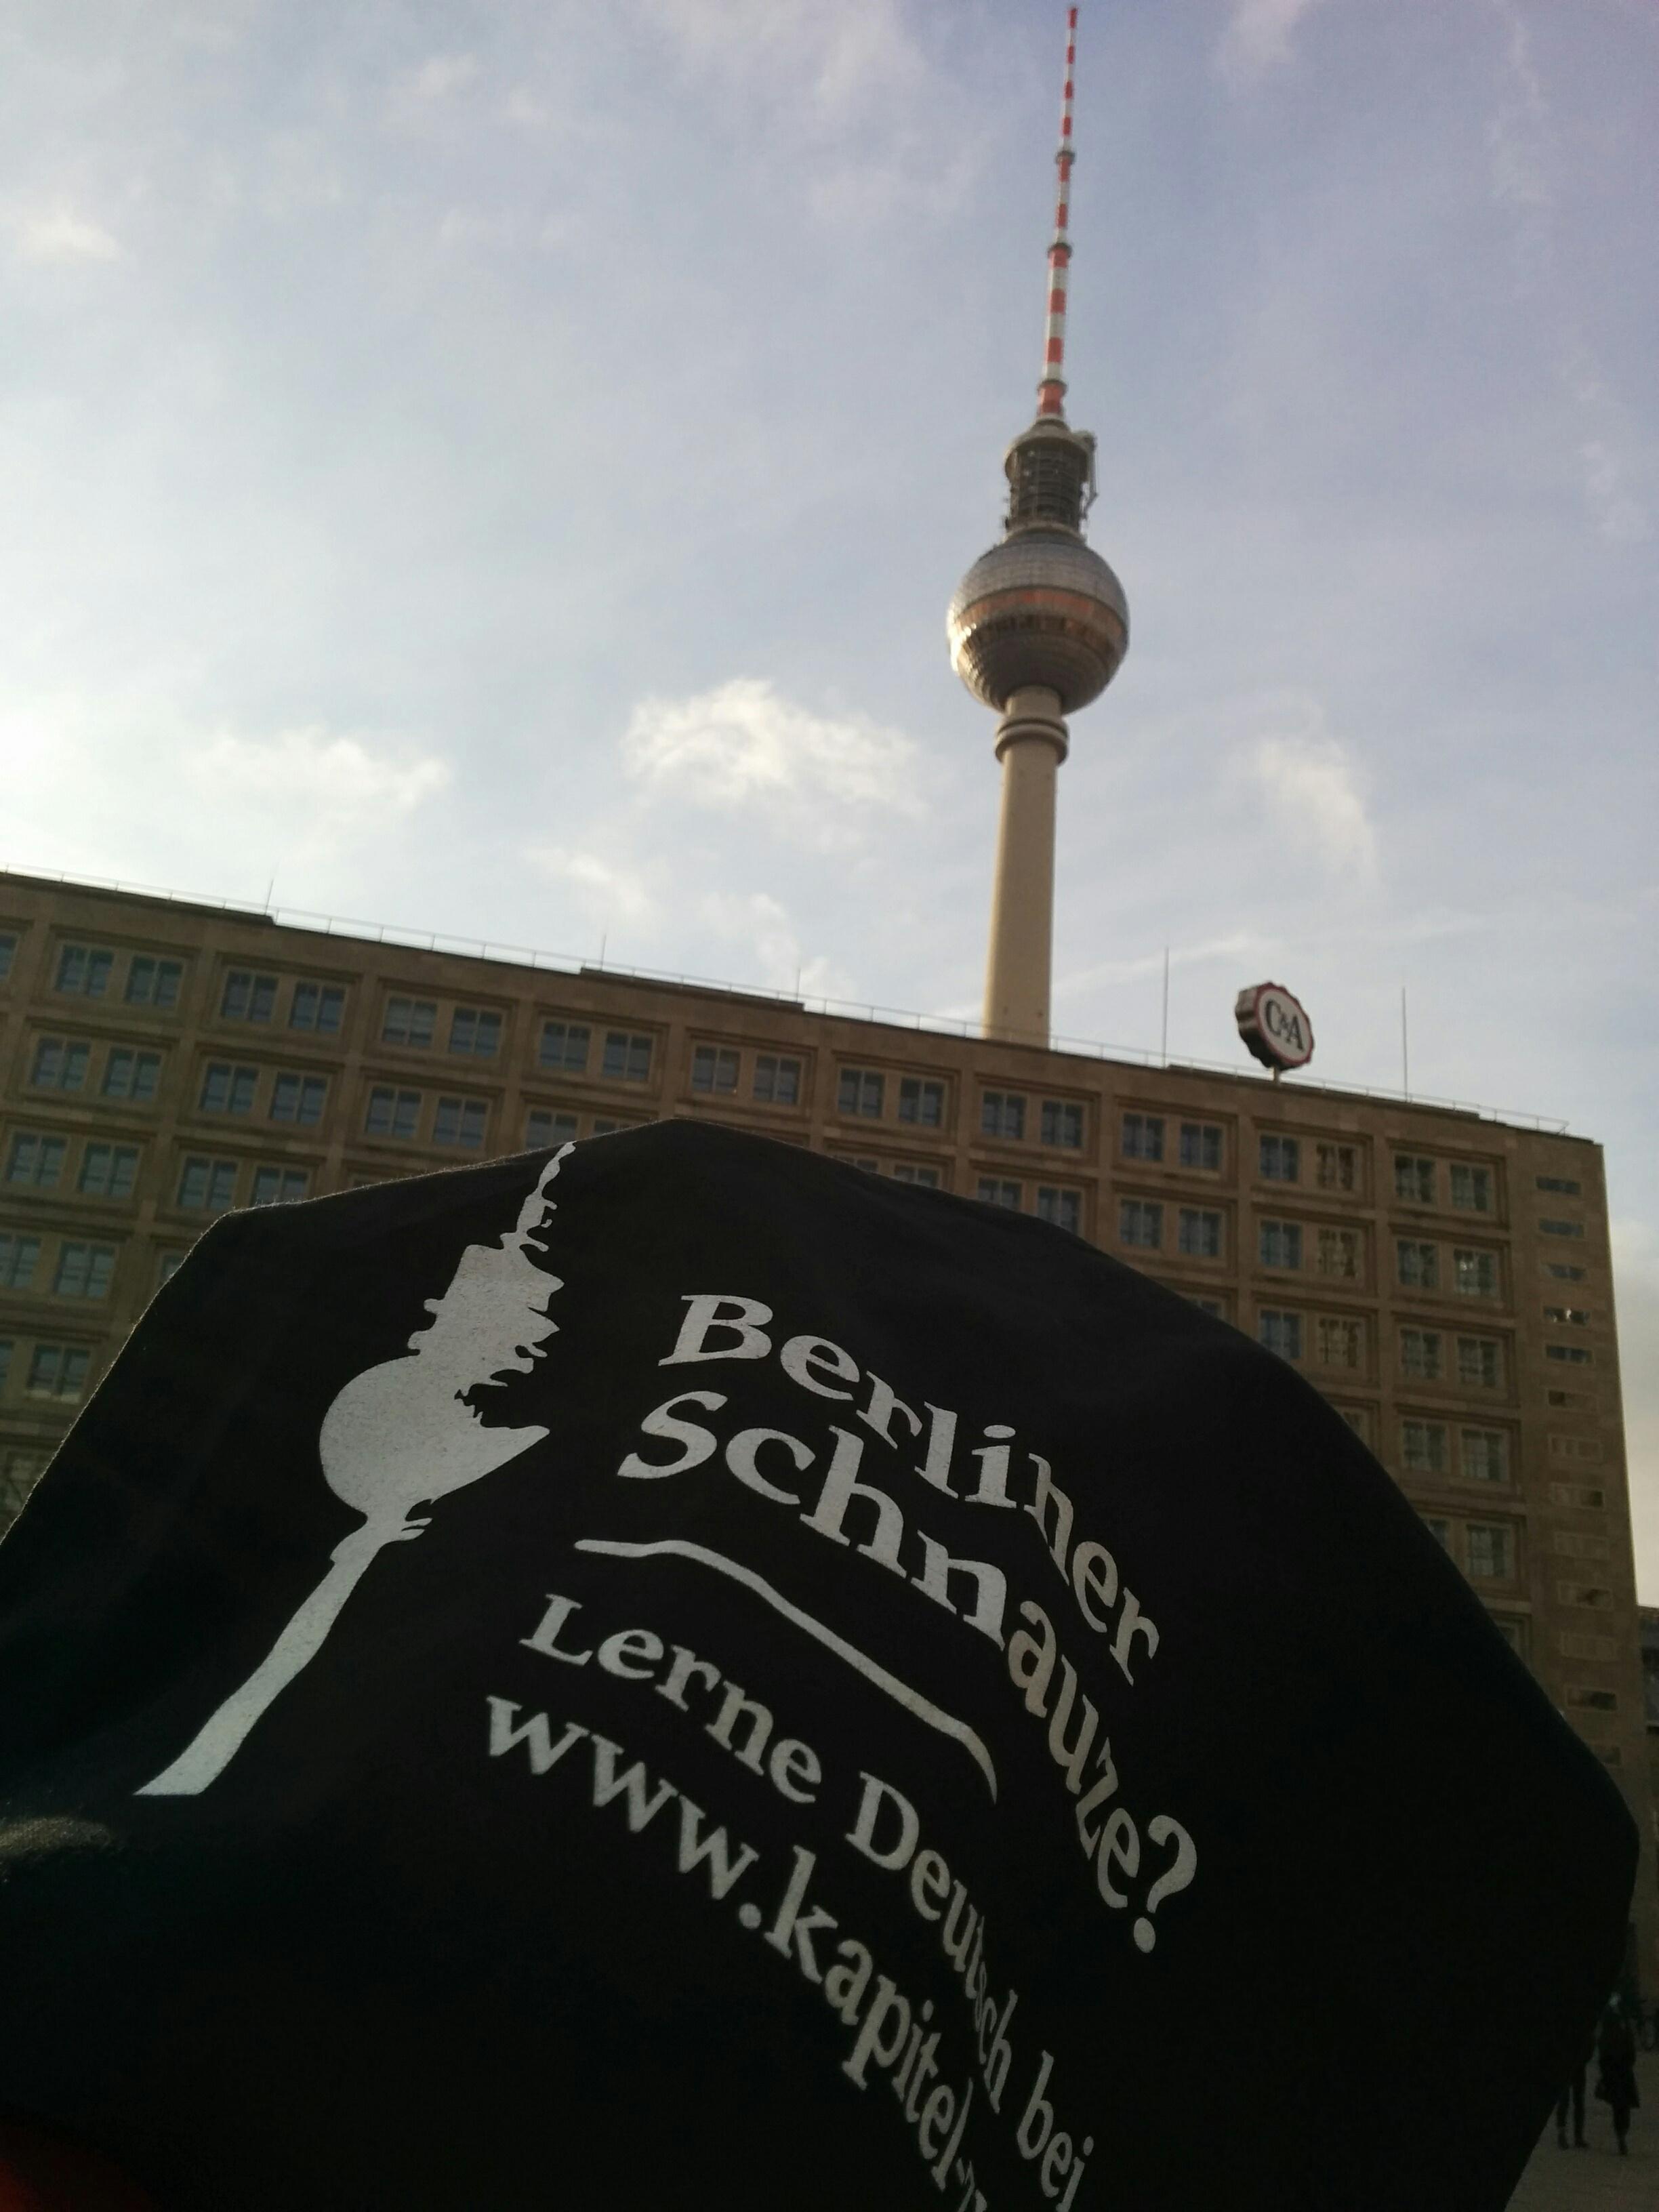 Kapitel Zwei Berlin guide touristique